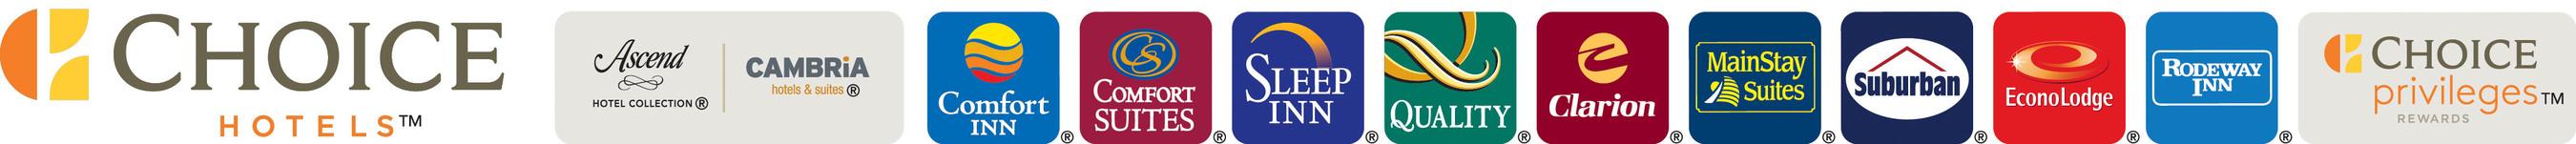 Choice Hotels International Logo chain